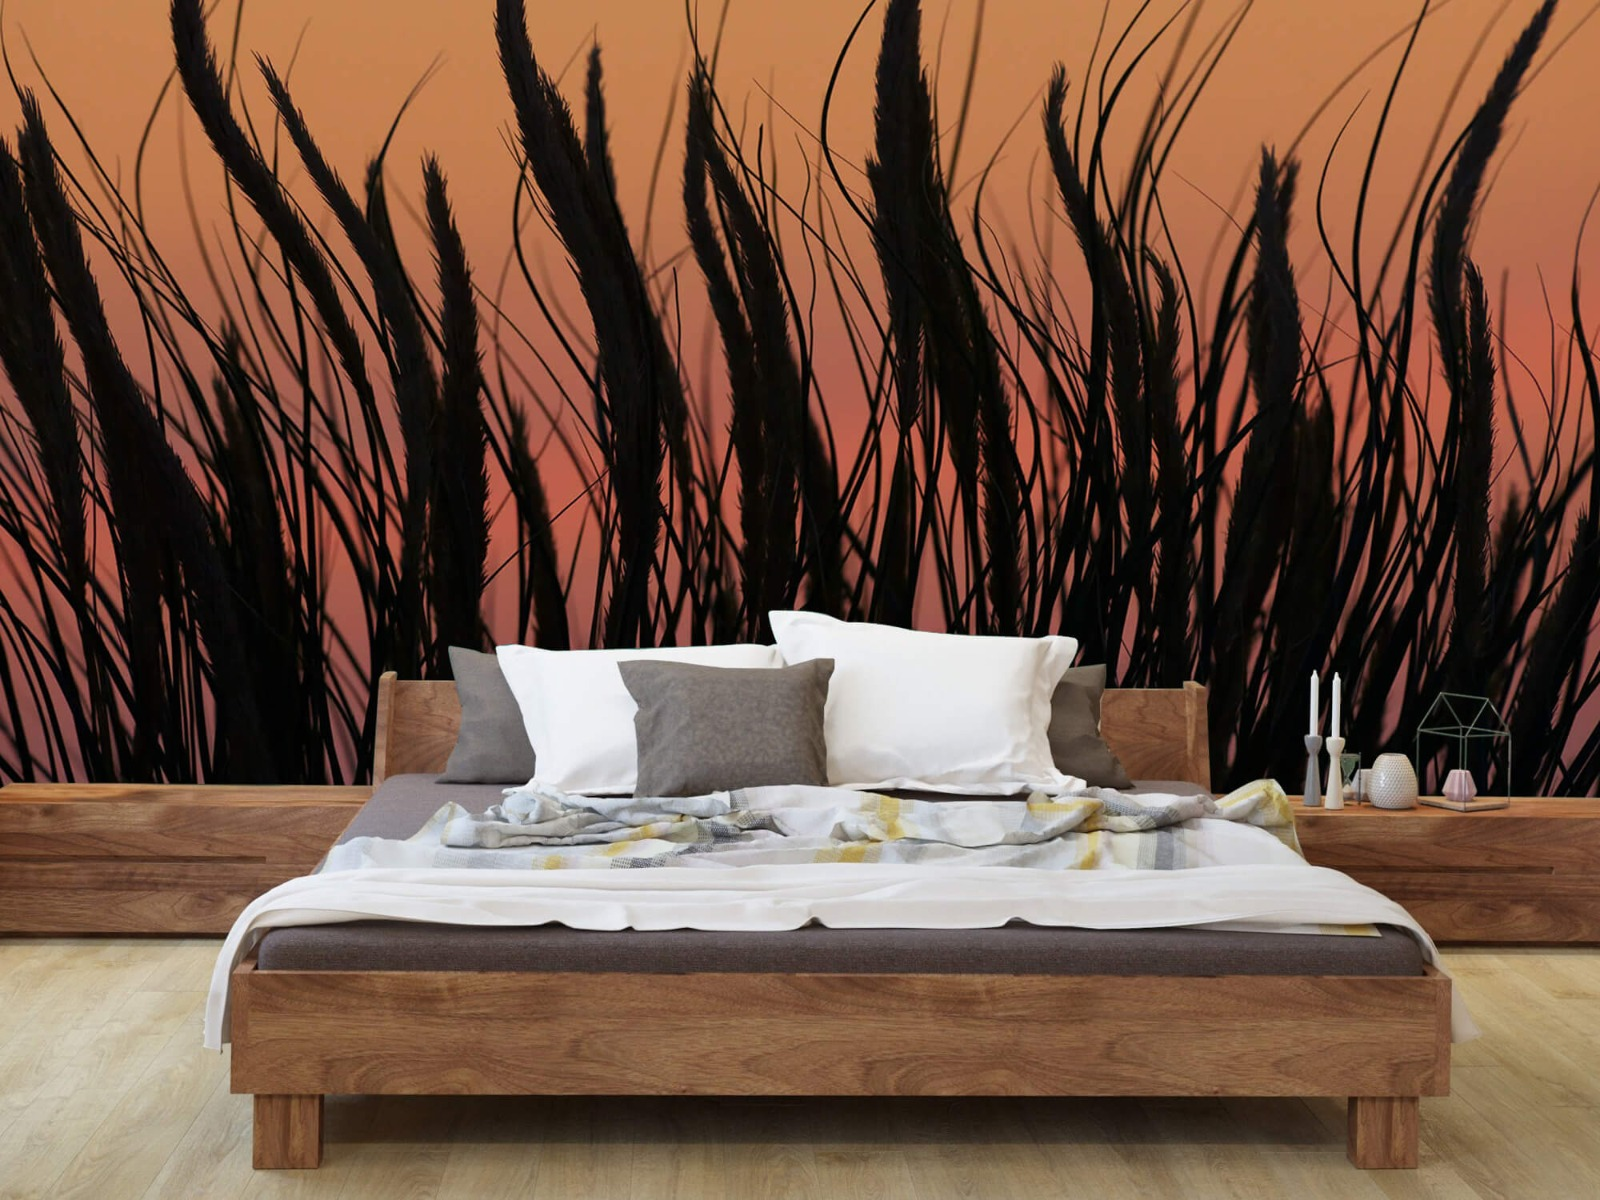 Zomer behang - Helmgras in de avond - Slaapkamer 7